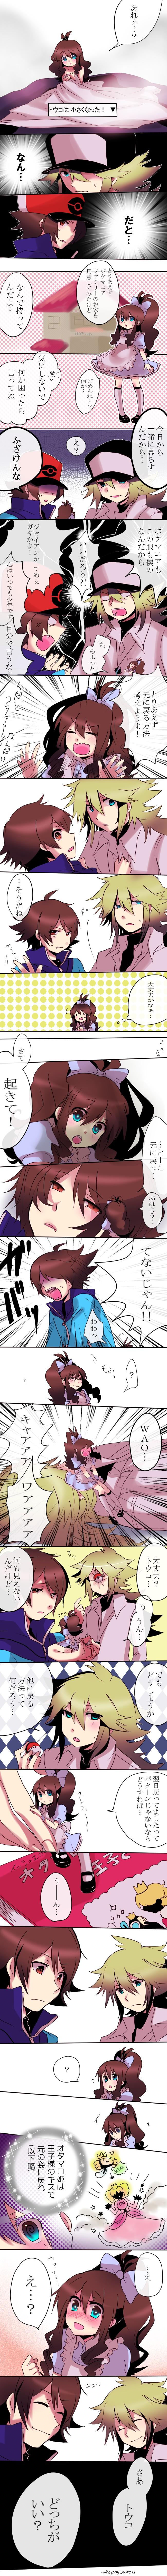 Pokemon Black/White | Pokemon BW | Hilbert | Hilda | N | Hilbert vs N x Hilda | Comic | Just for funny xD